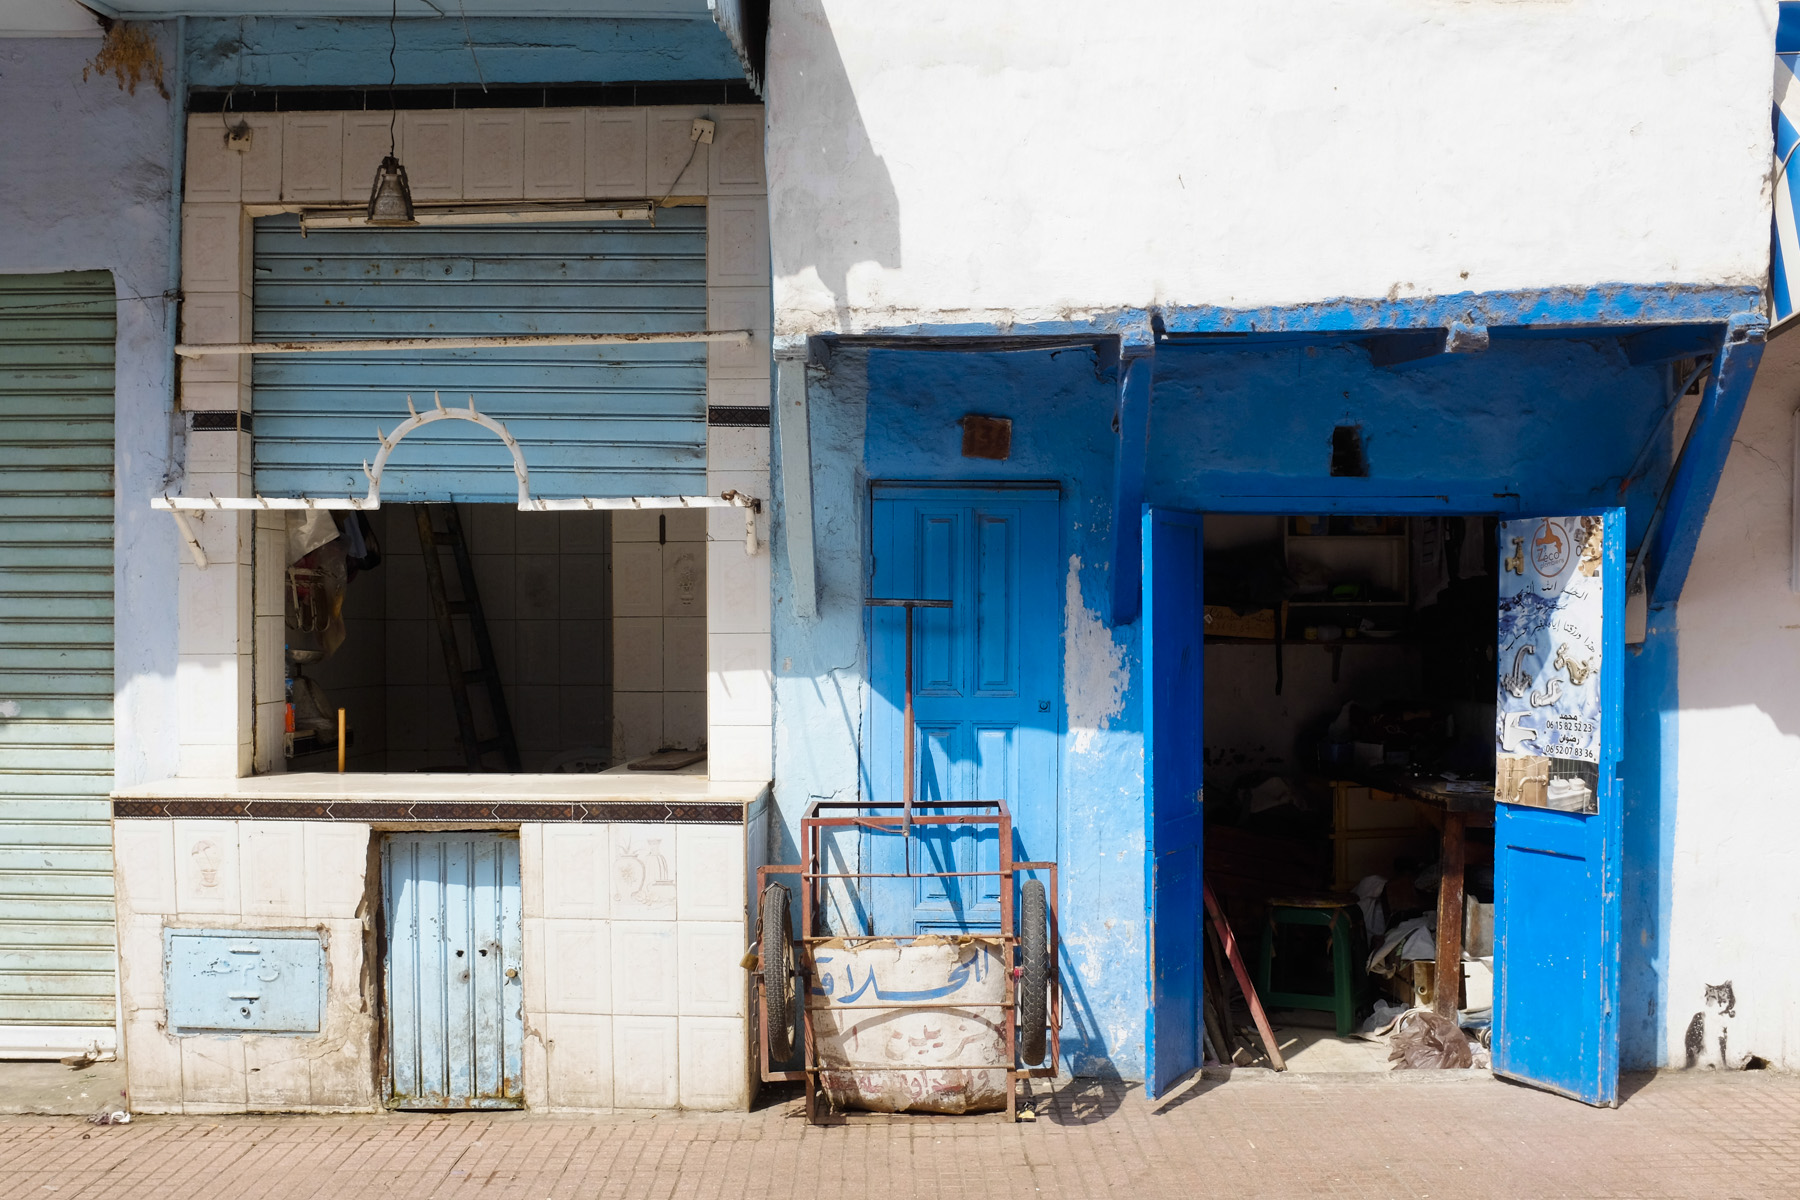 201307 Rabat 015.jpg